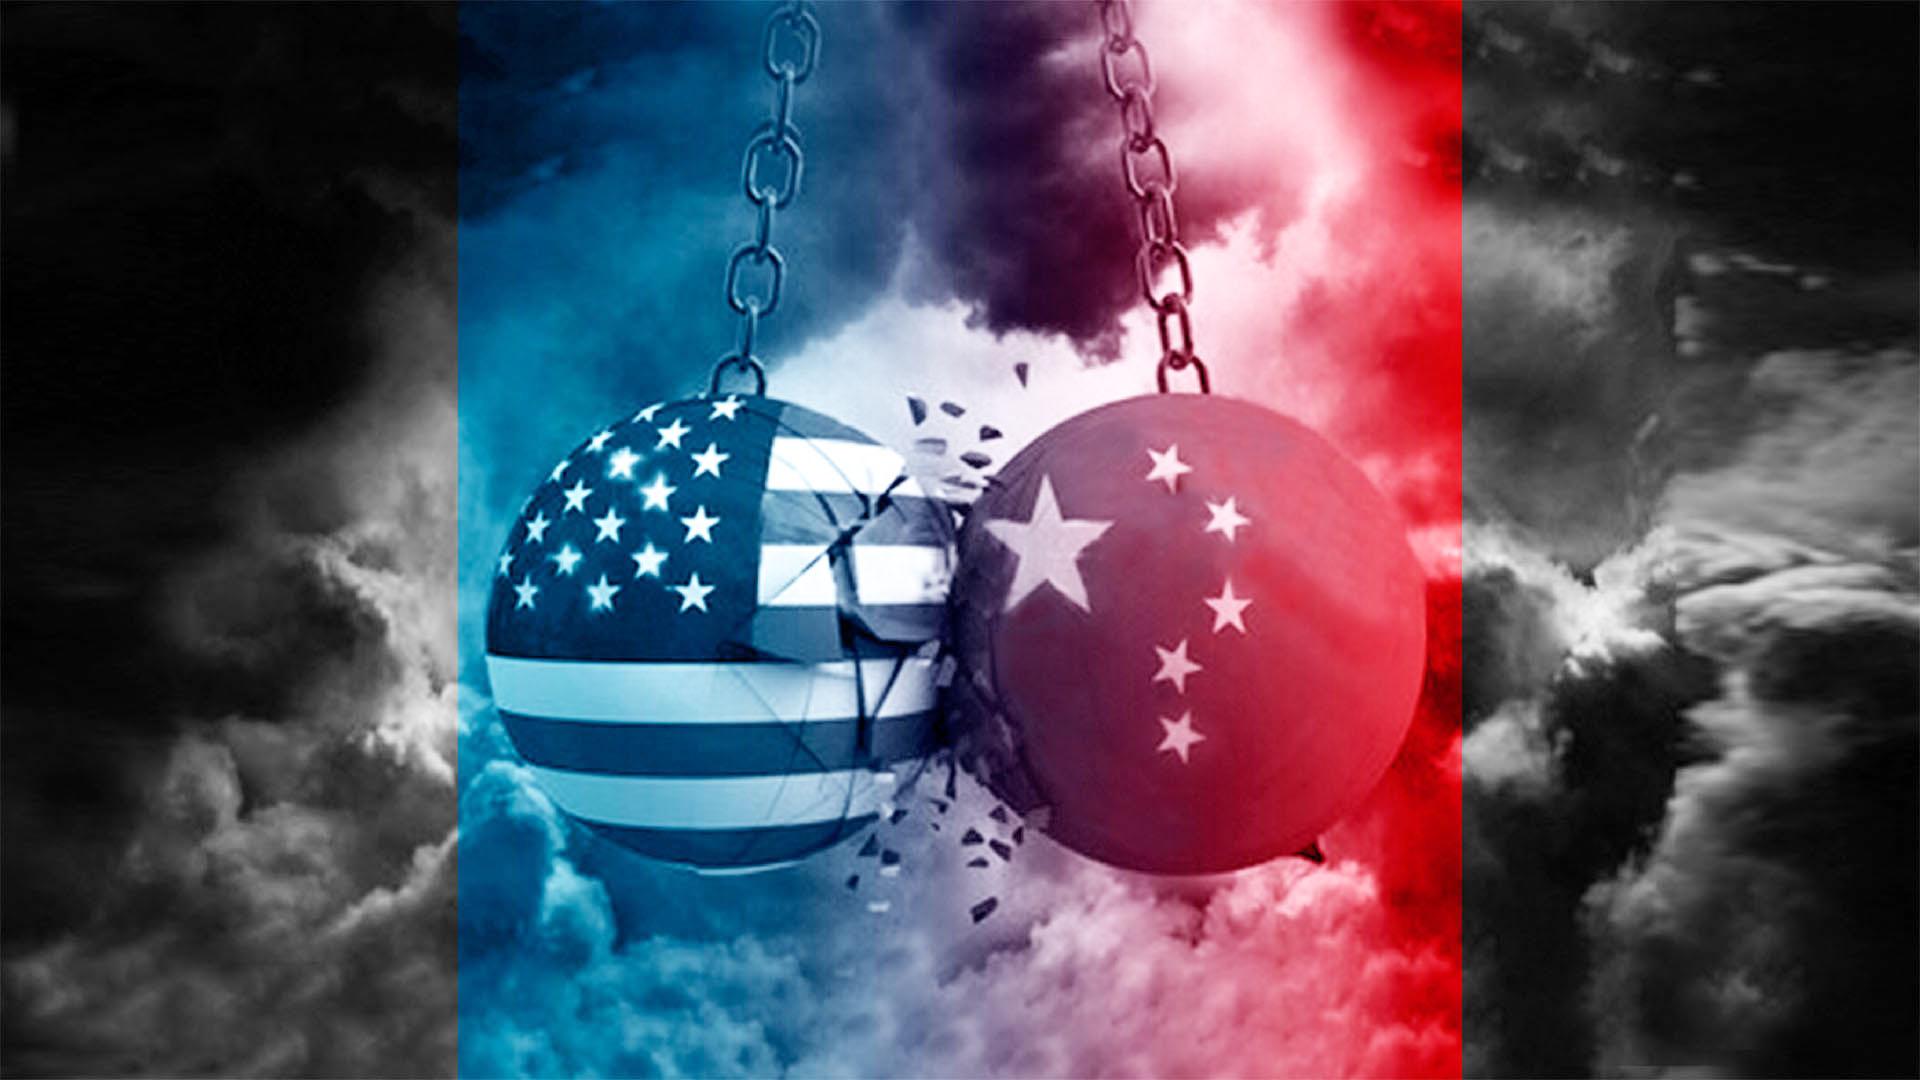 EE. UU. vs China: xenofobia y guerra fría, por Víctor Álvarez R. / Davgla Rodríguez A.